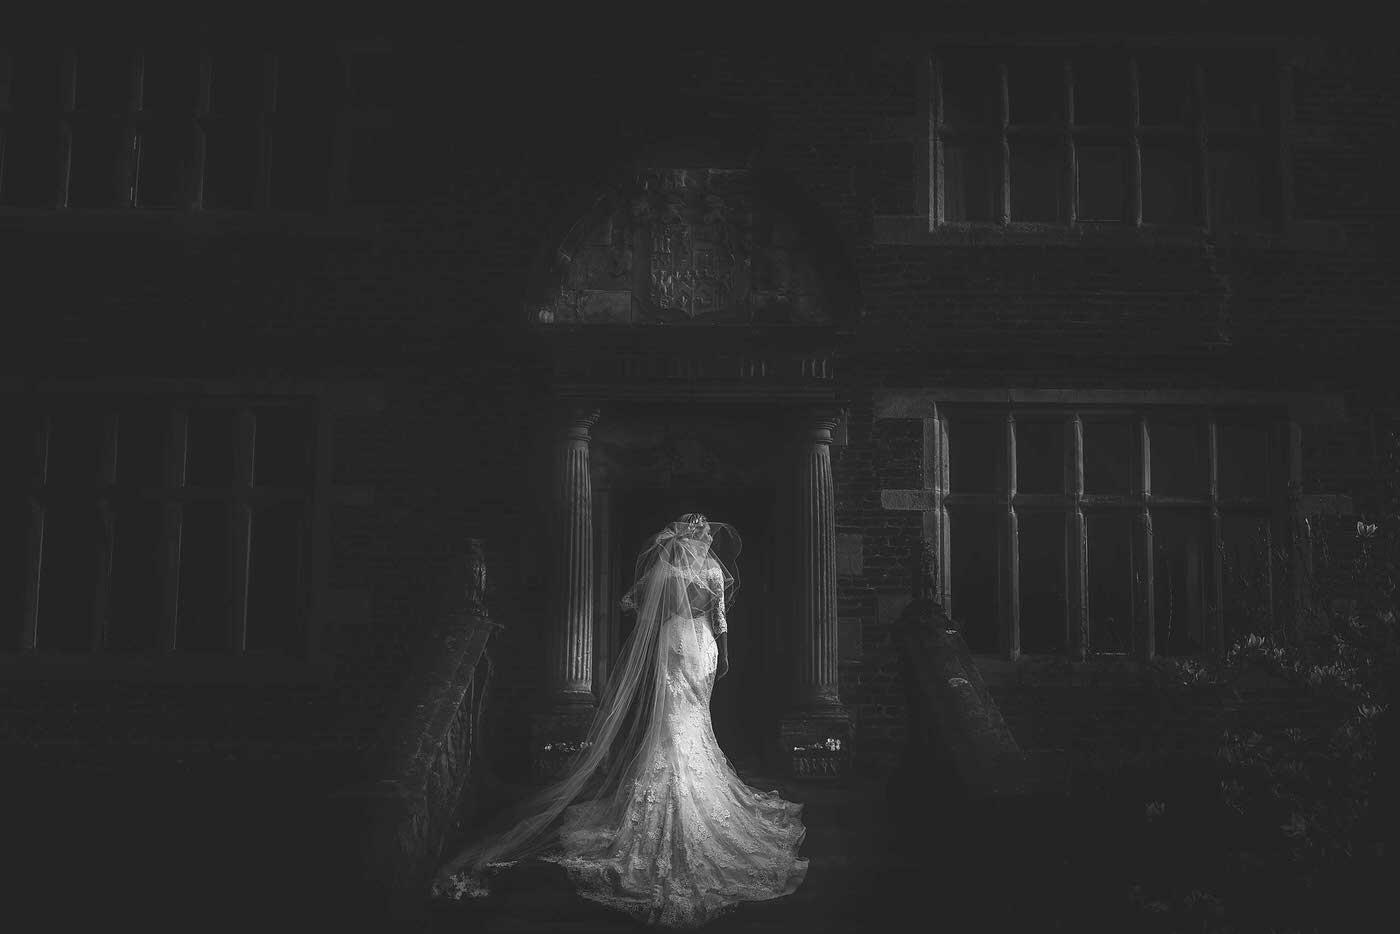 soulton hall wedding 08bw